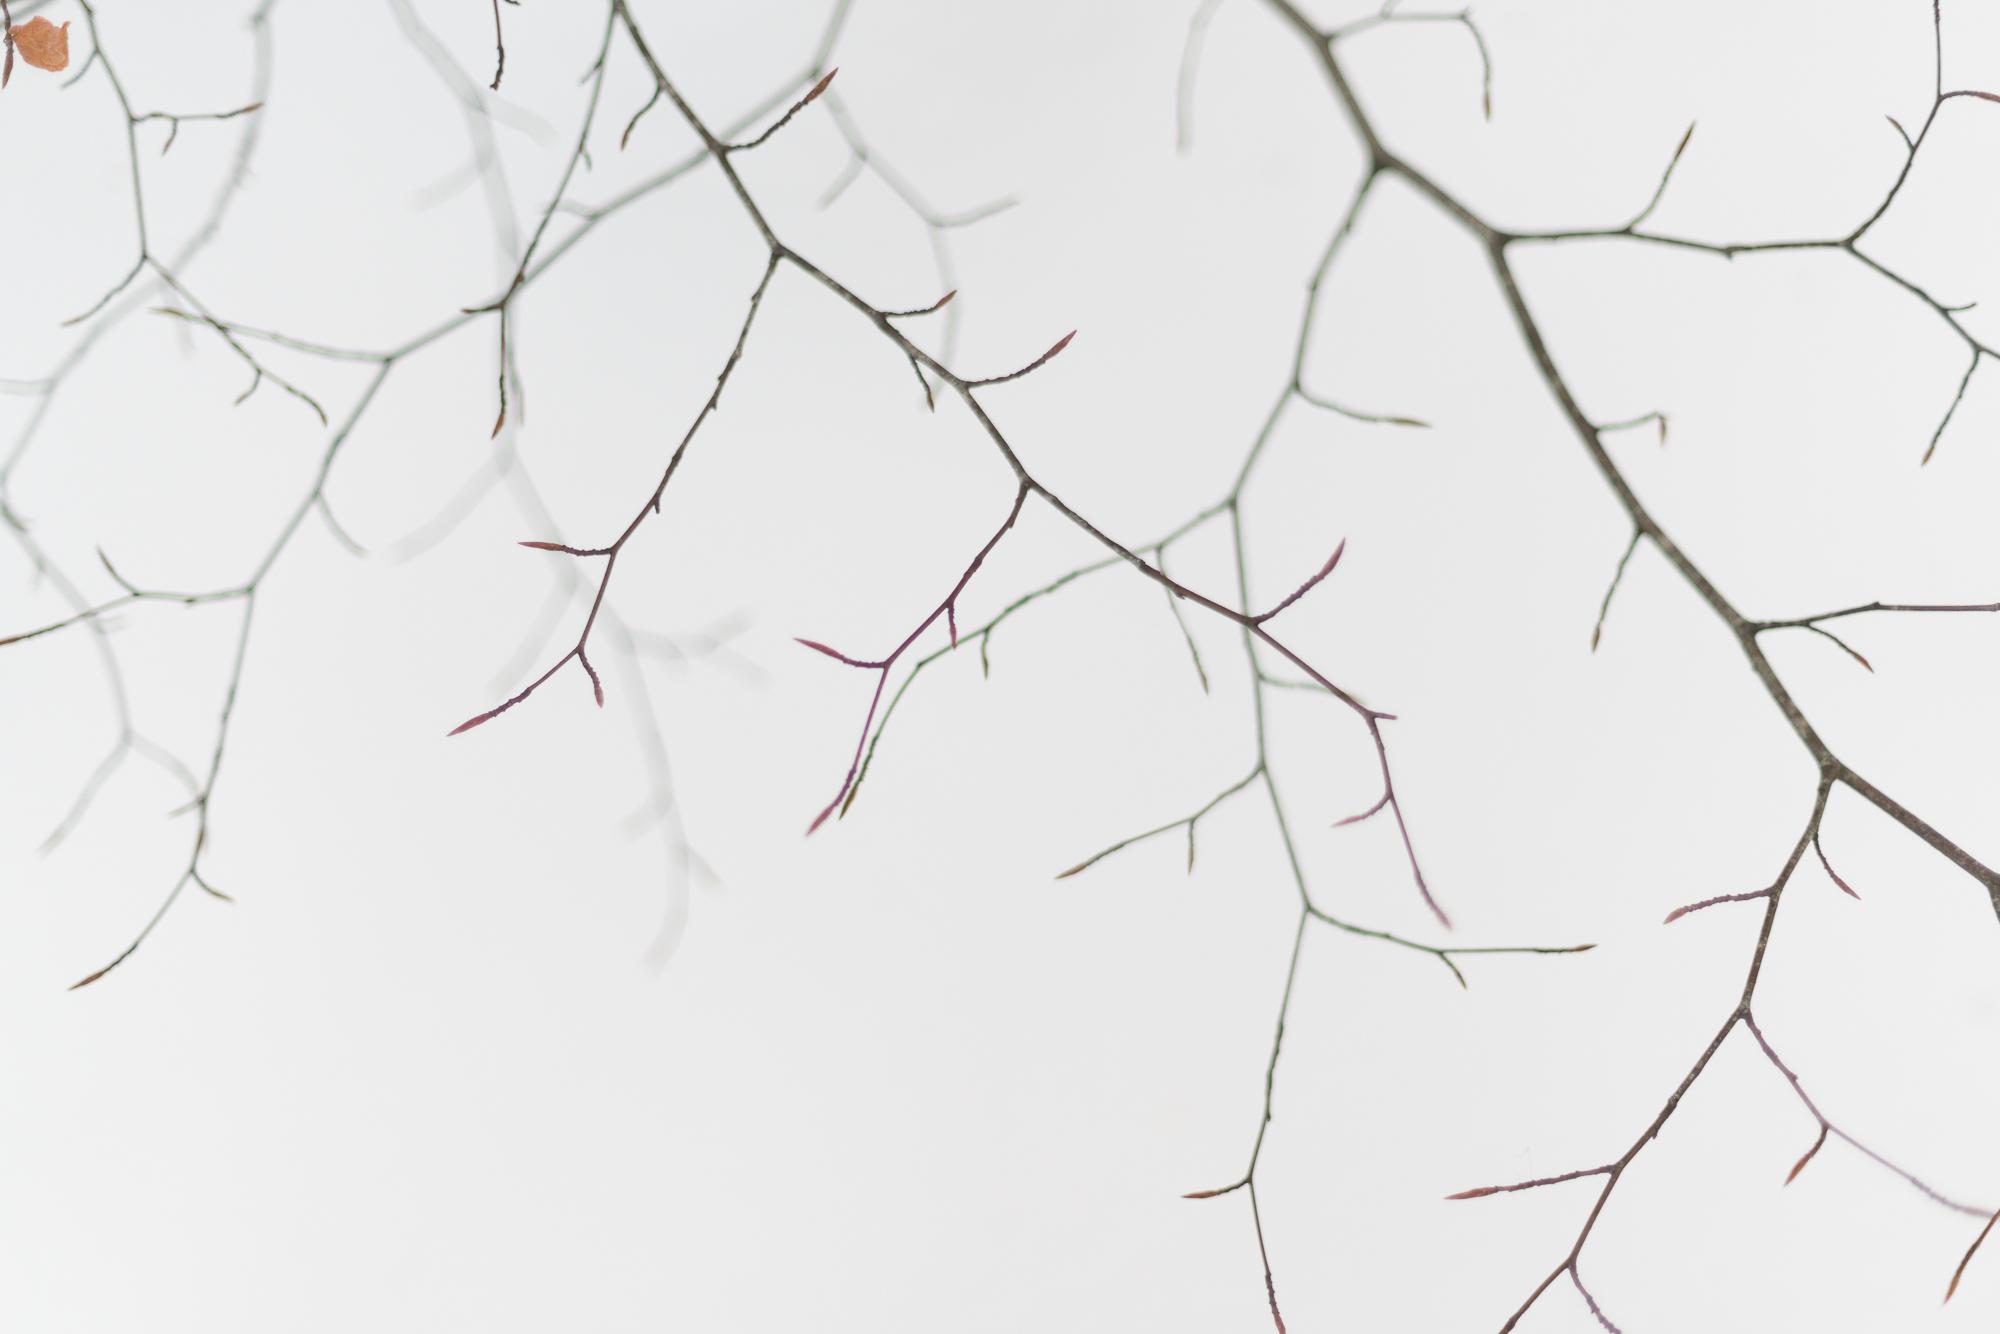 Autumn leaf-_DSC1813.jpg